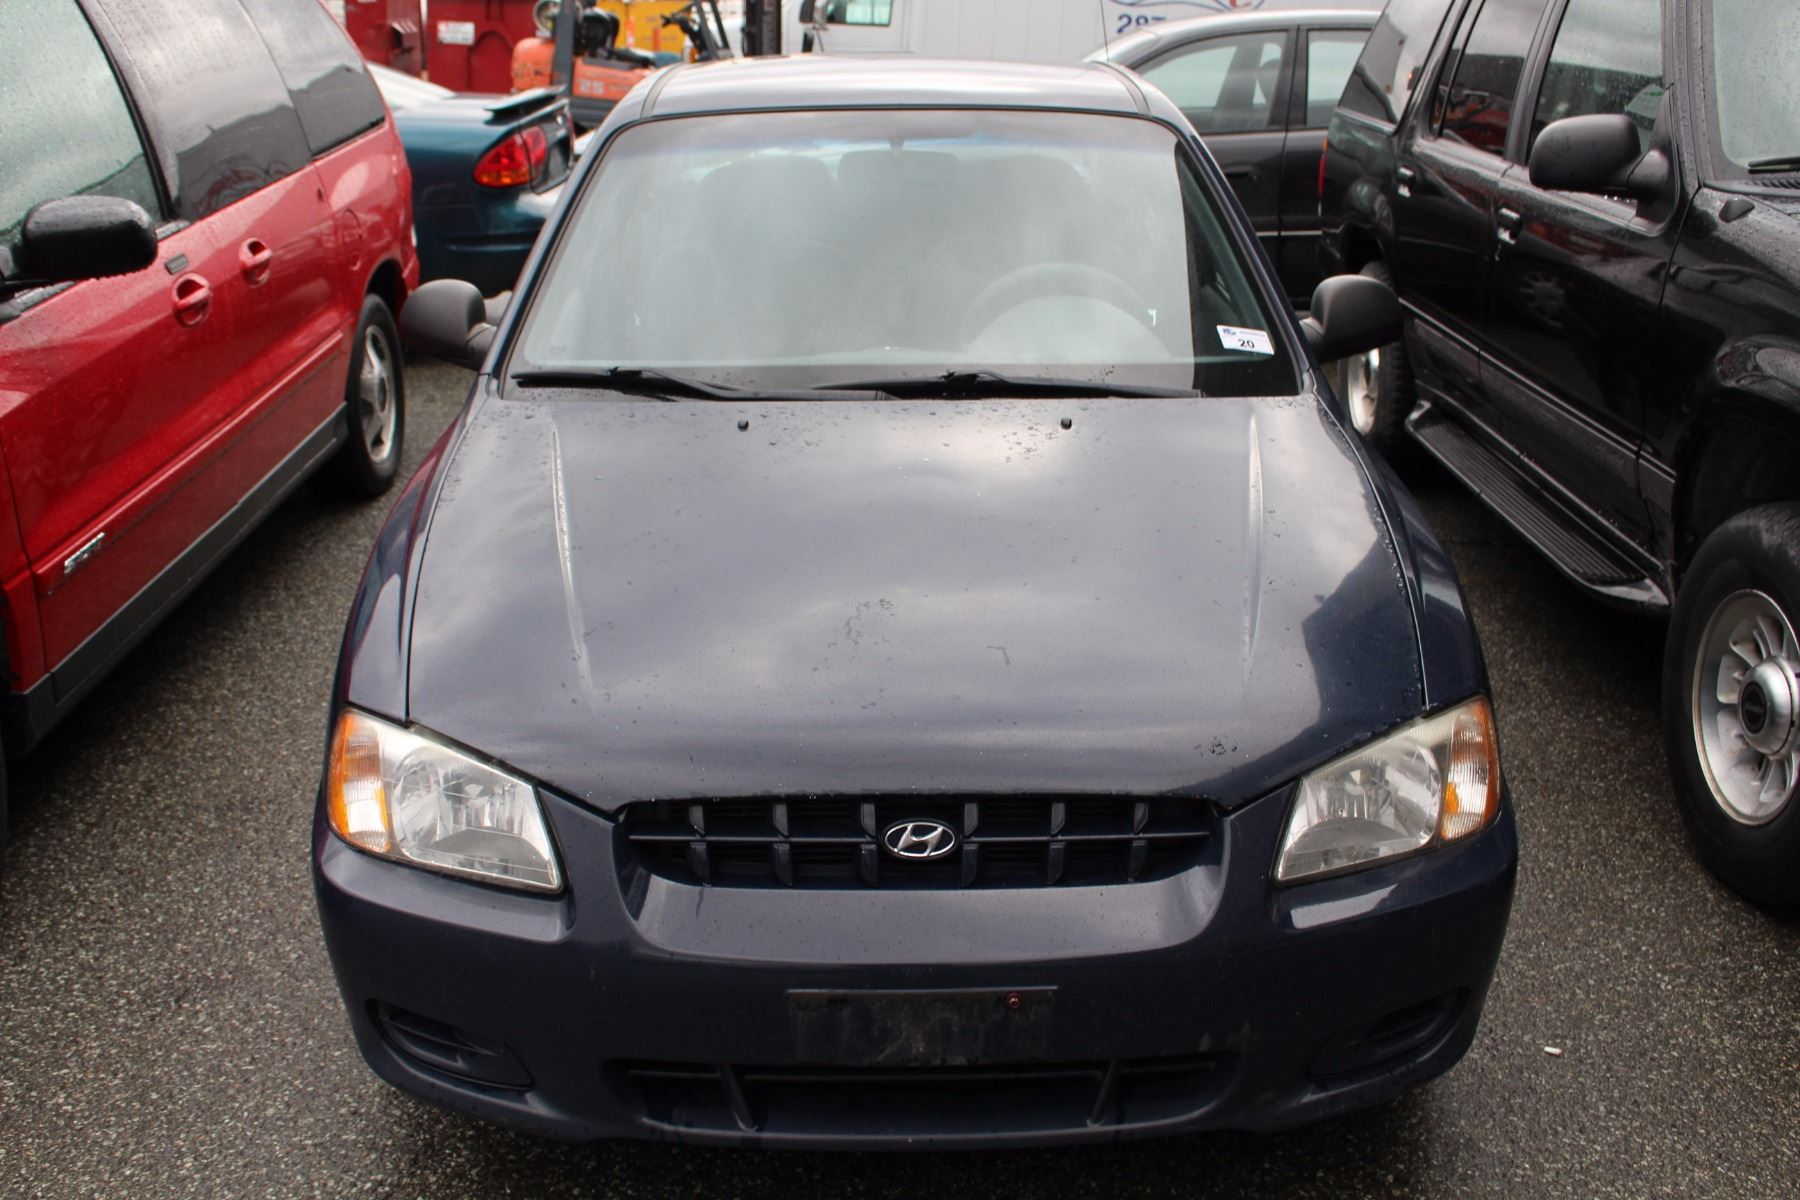 2002 hyundai accent gl 4 door 4 cylinder blue automatic gas 233 127 kms vin 2002 hyundai accent gl 4 door 4